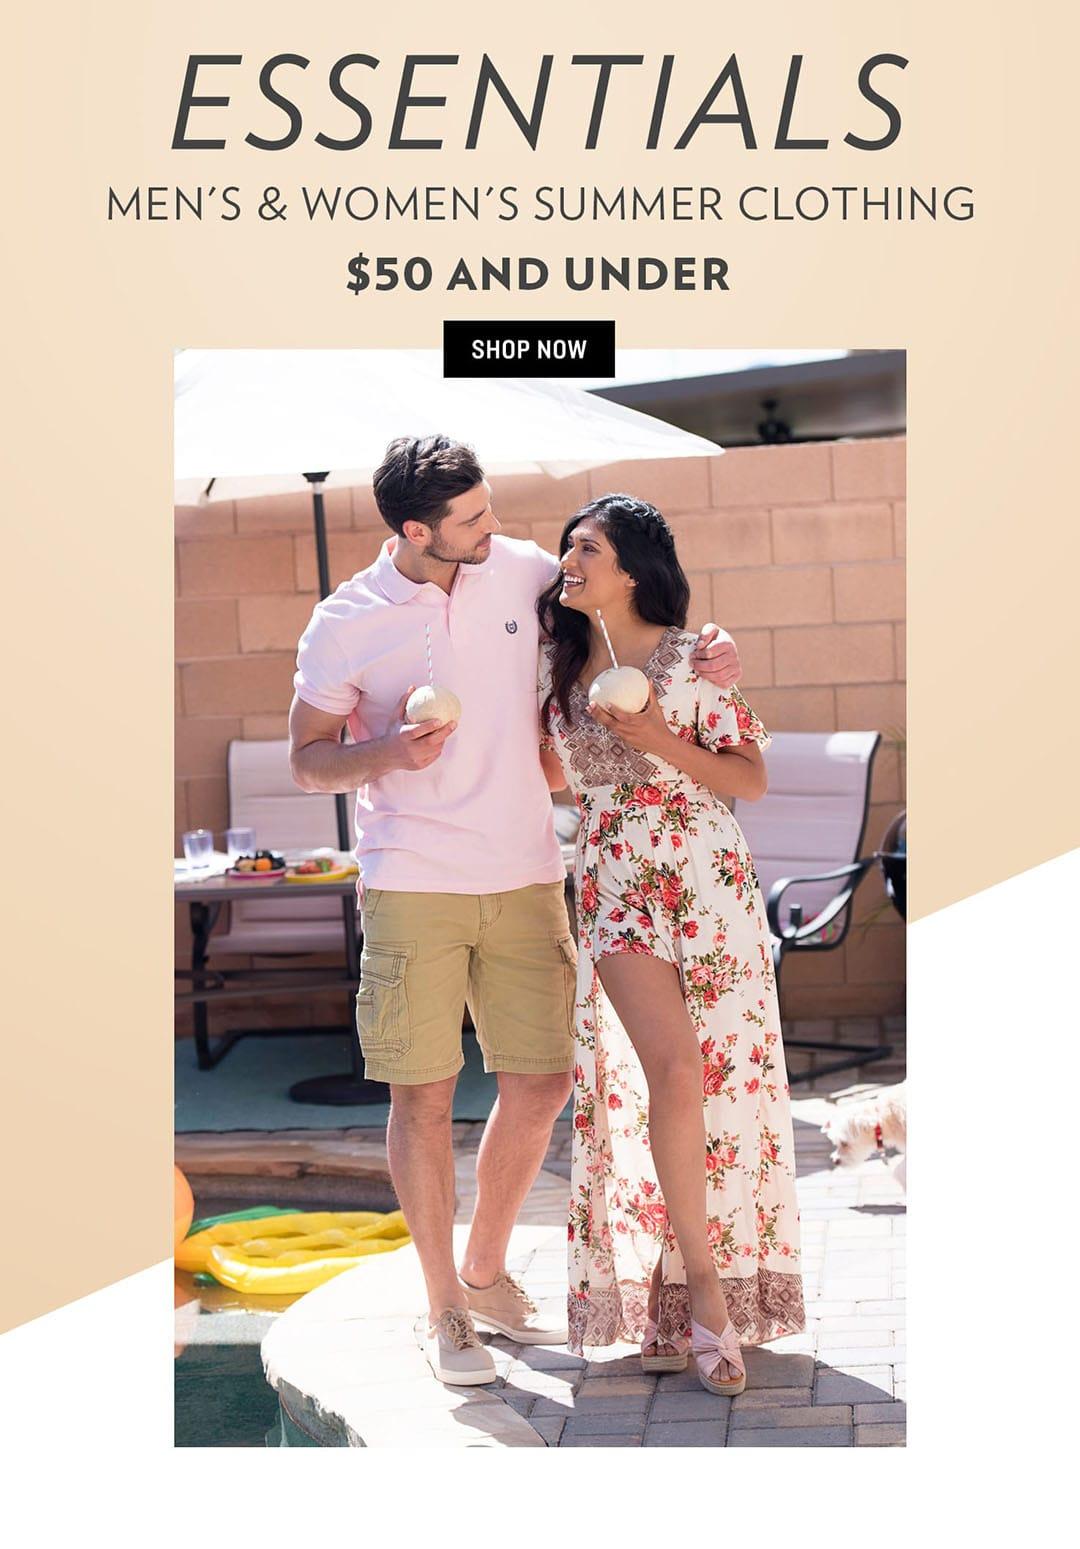 Shop Men's & Women's Summer Clothing